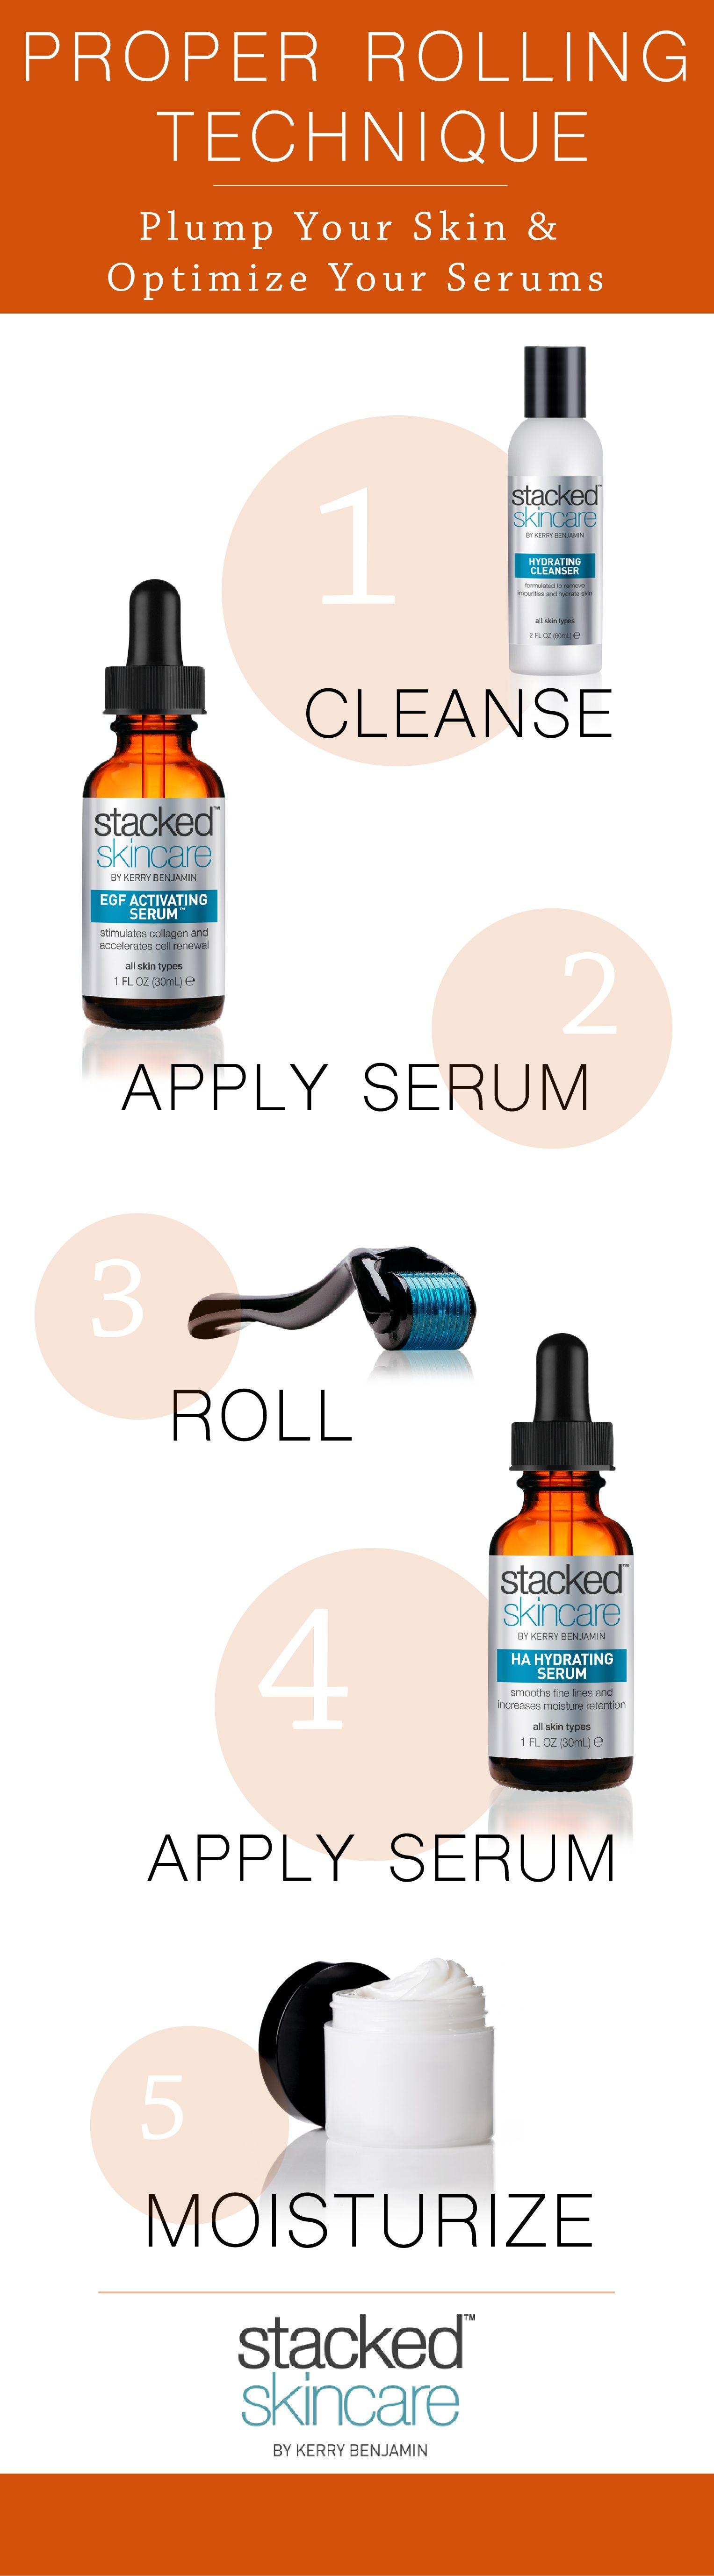 Benefits Of Microneedling At Home Anti Aging Skin Treatment Skin Care Under Eye Wrinkle Cream